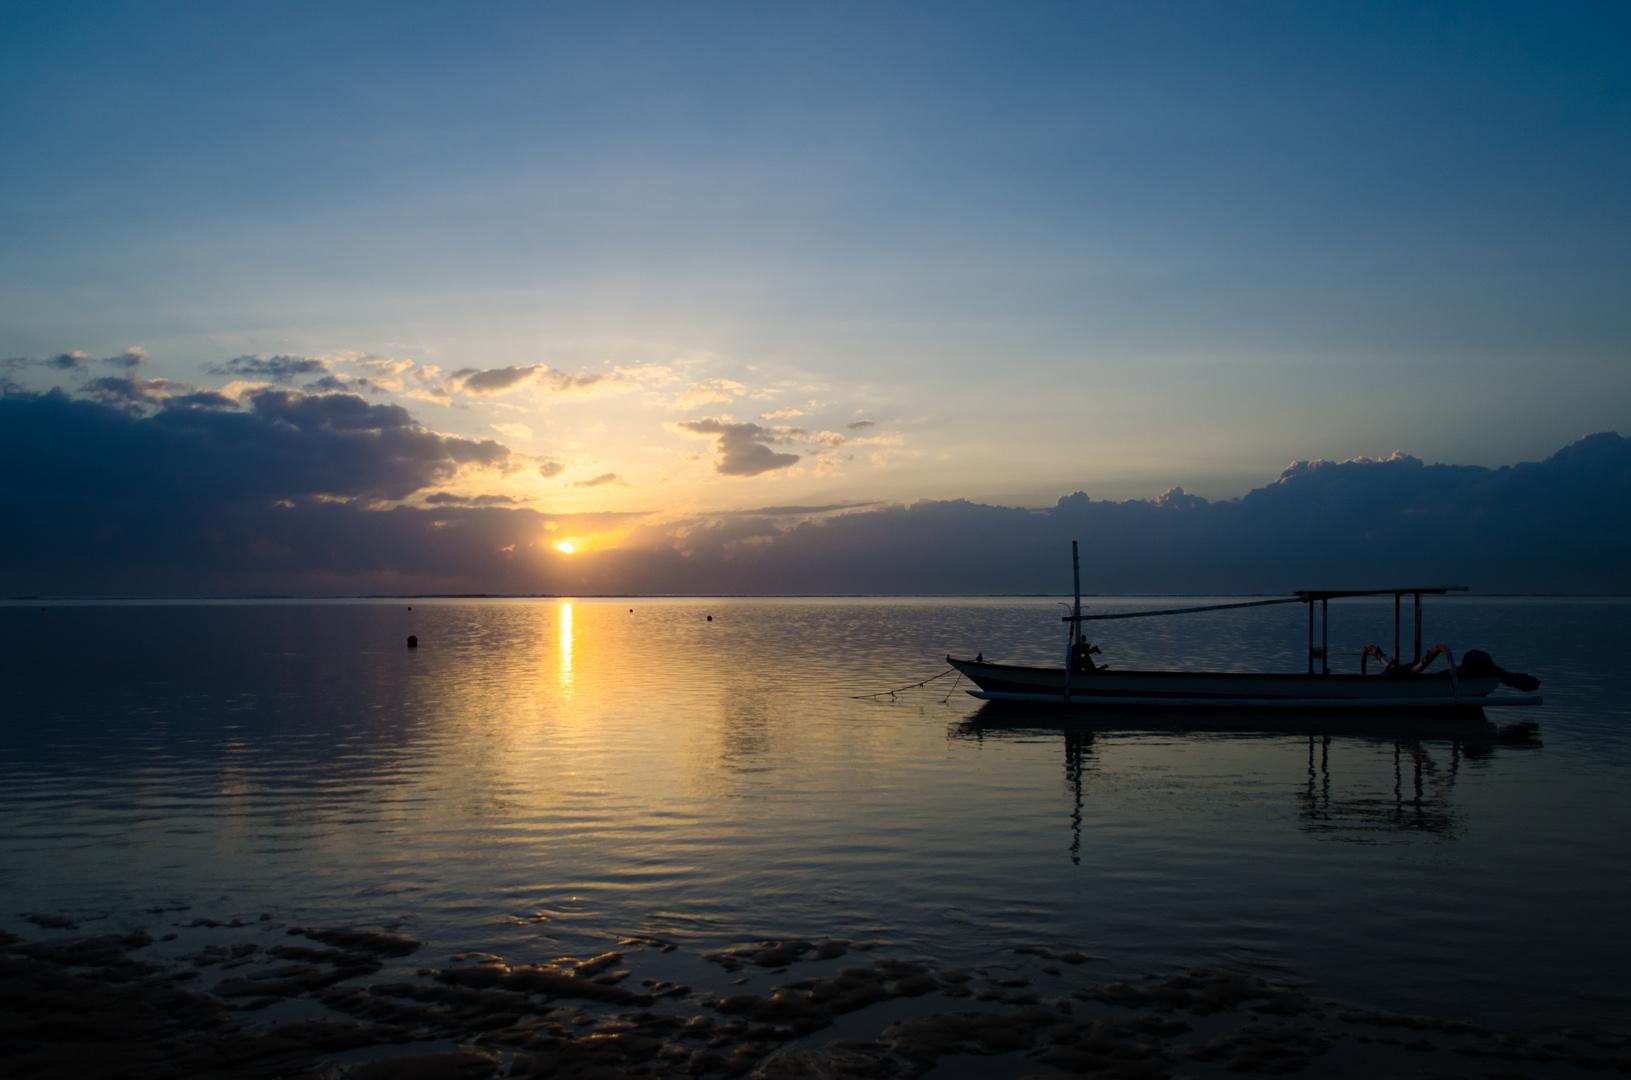 Sonnenaufgang auf Bali